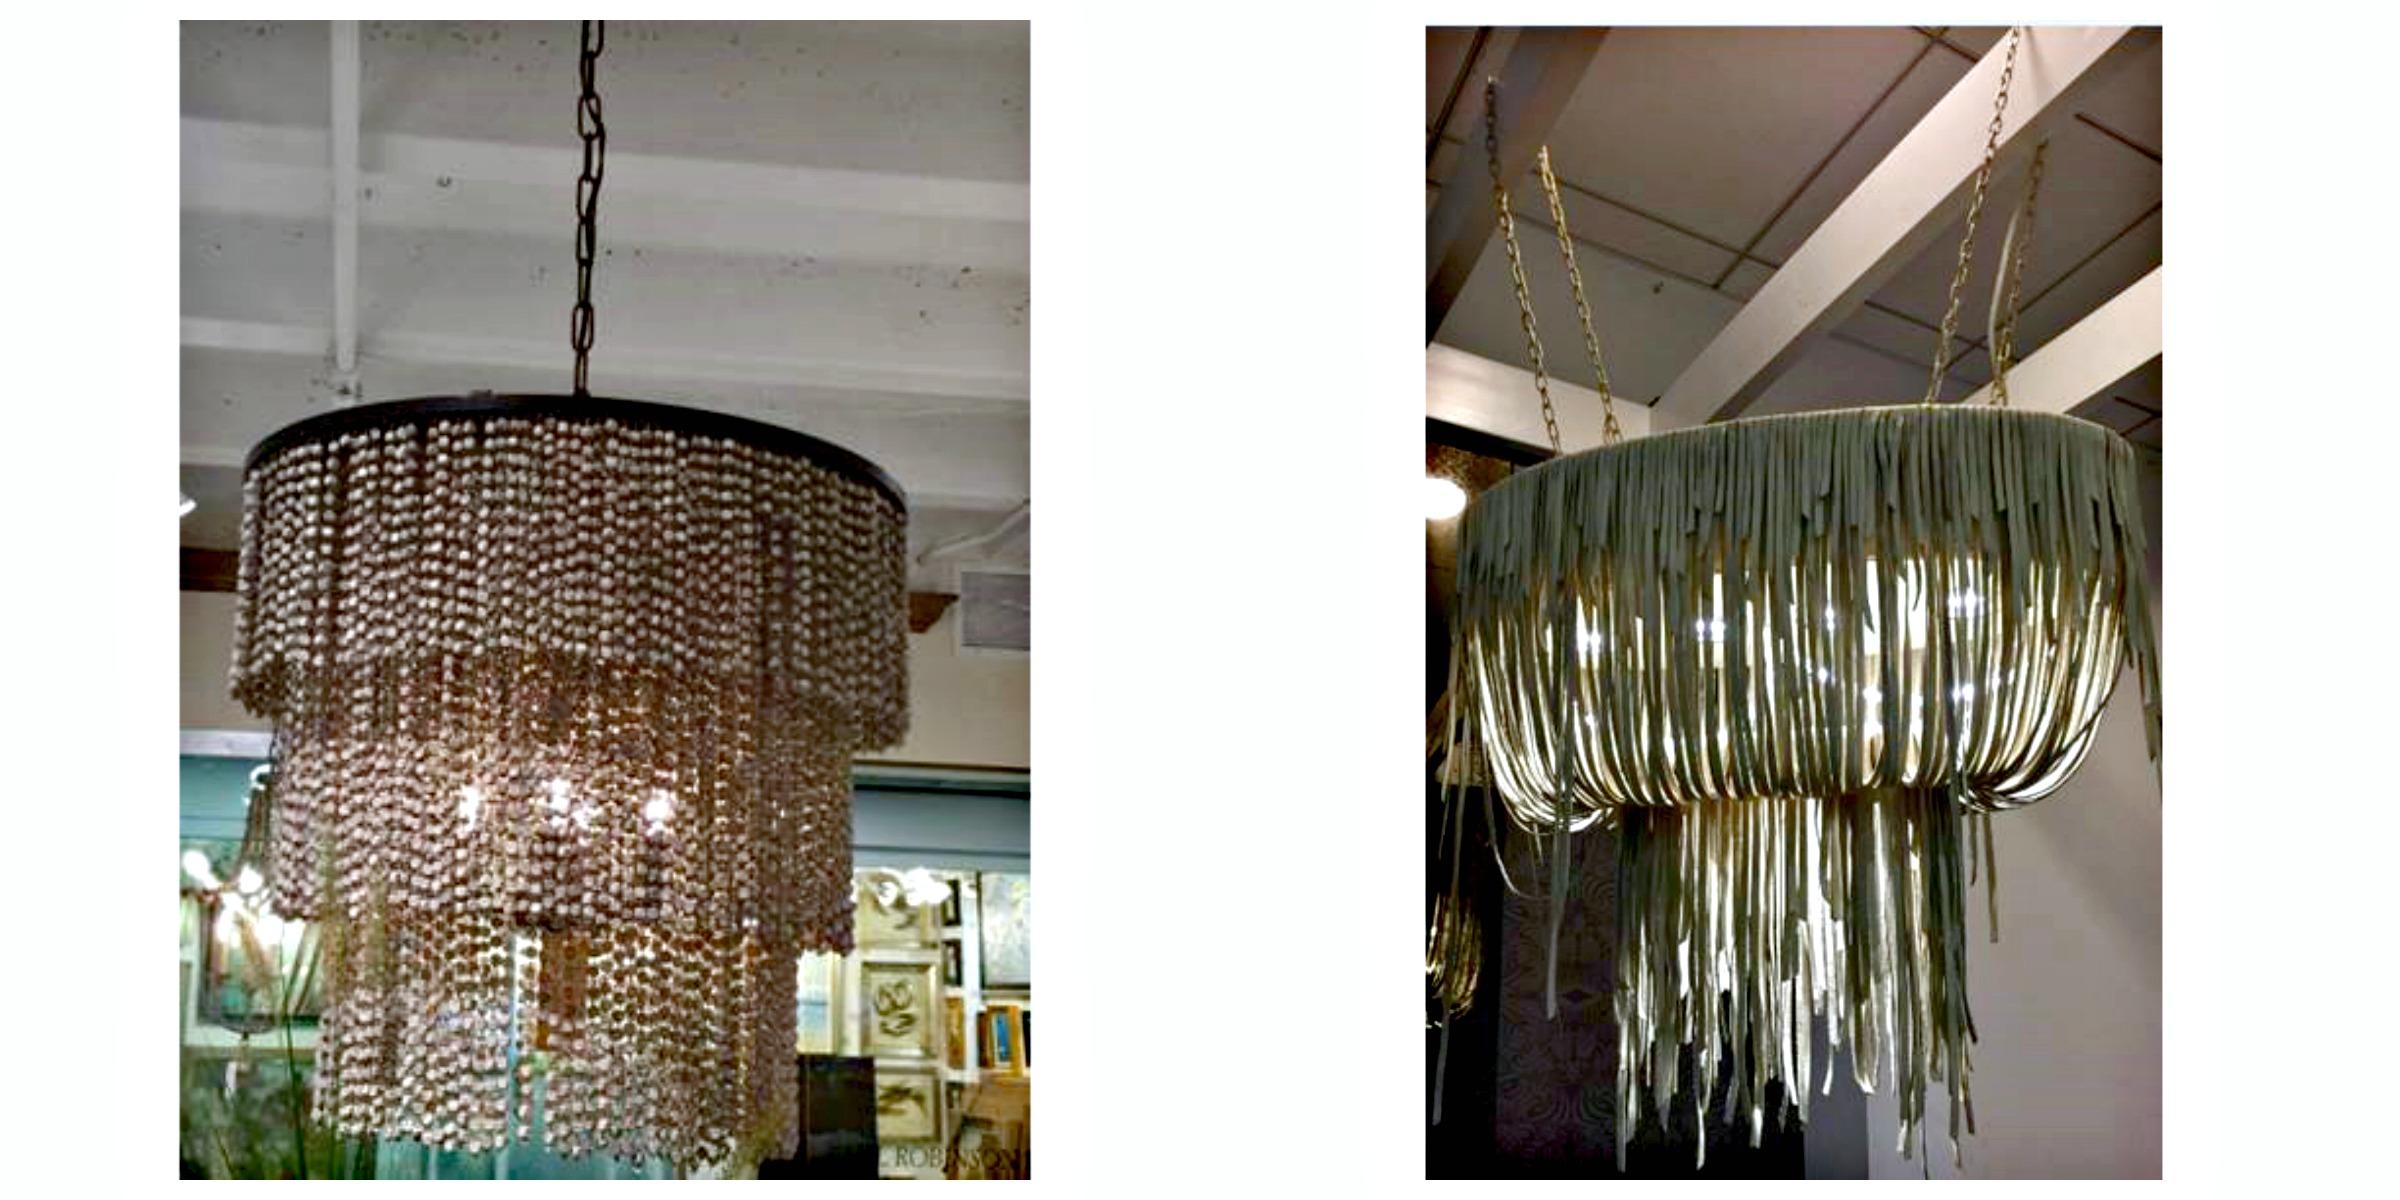 Lighting 3 Collage of Twin Companies